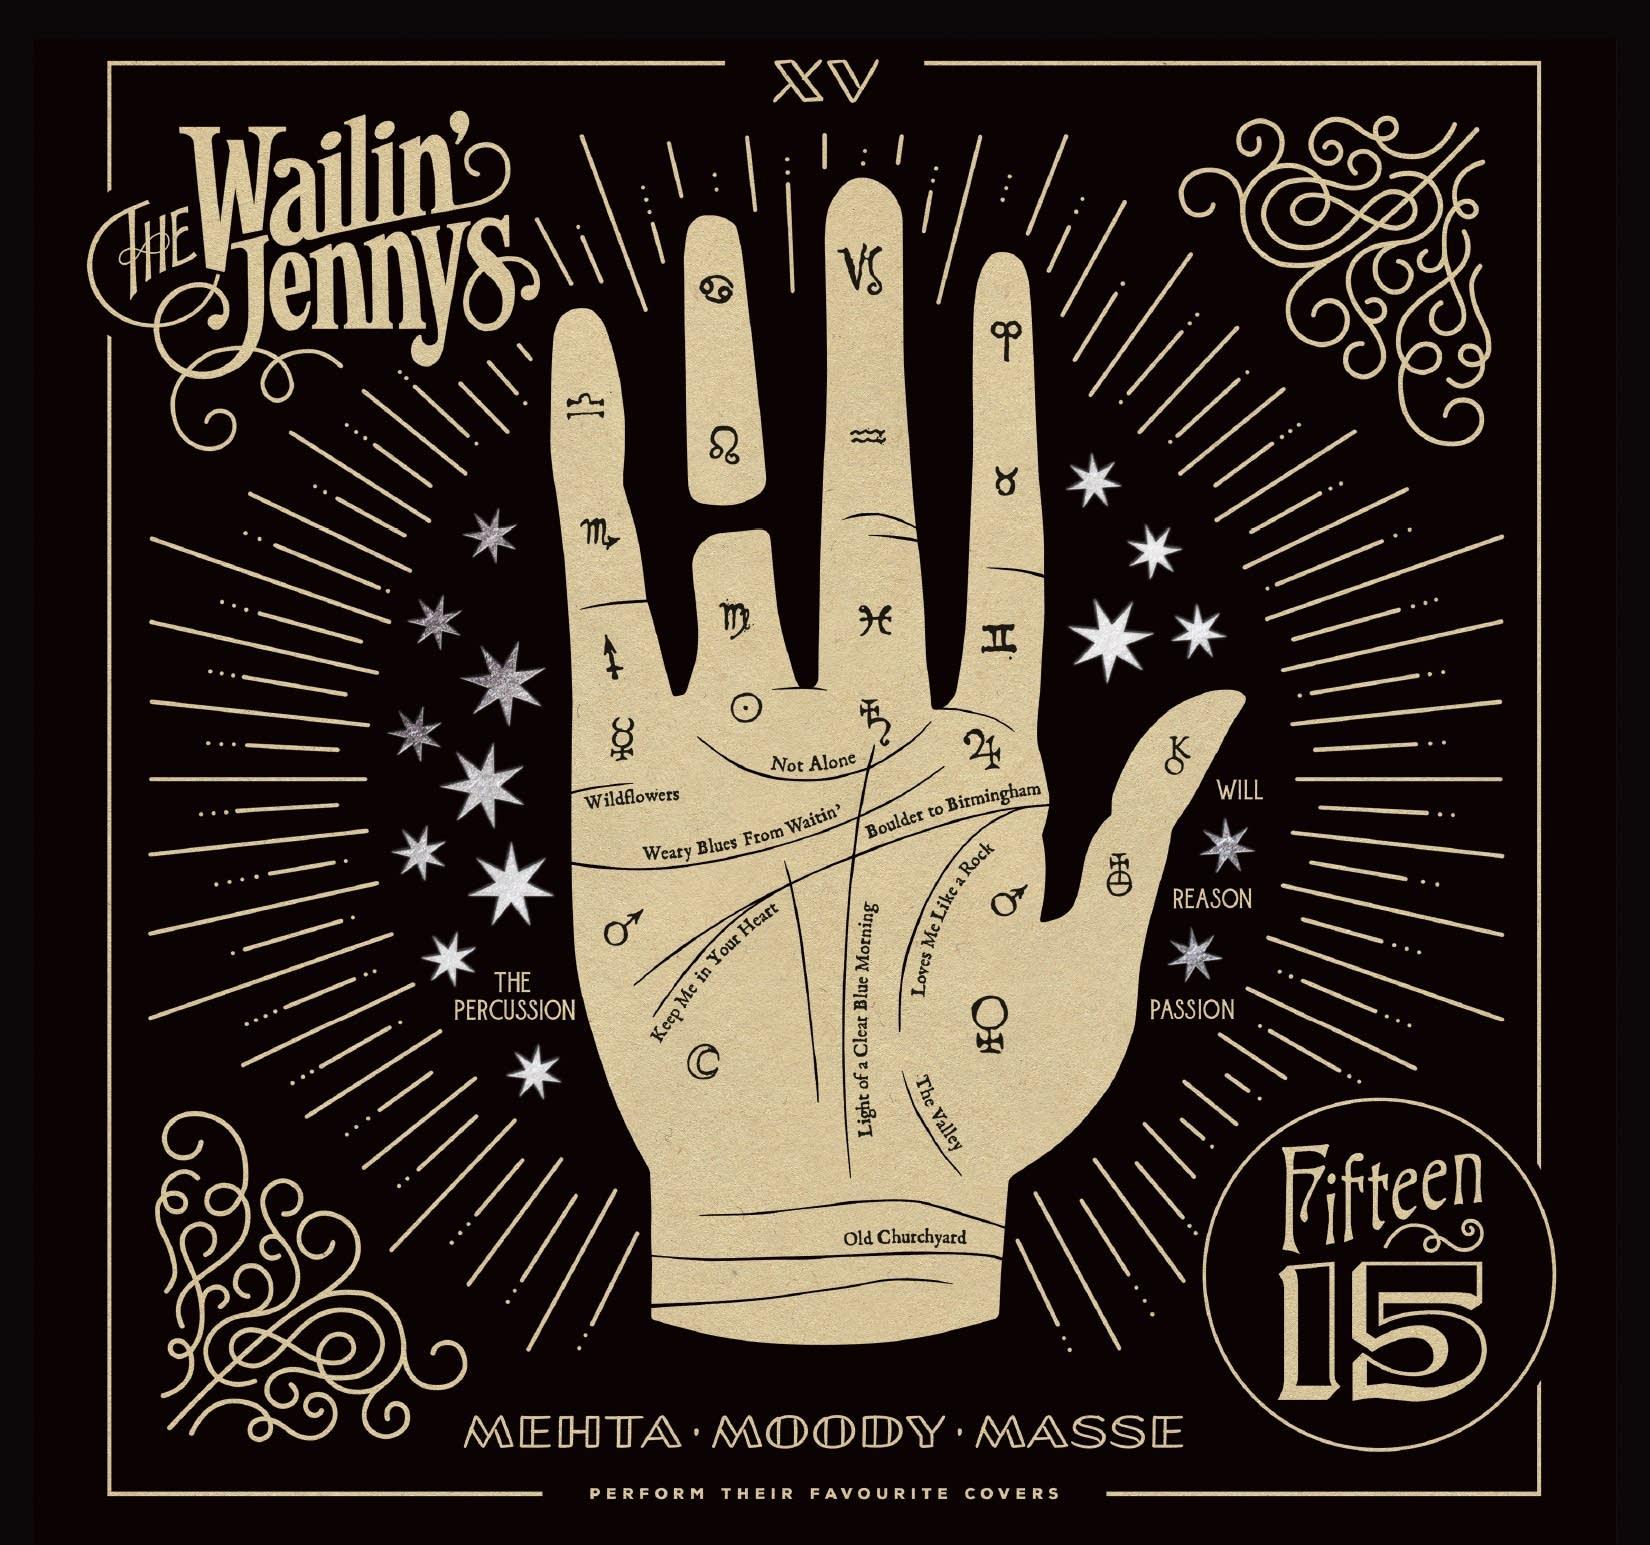 Fifteen by The Wailin' Jennys